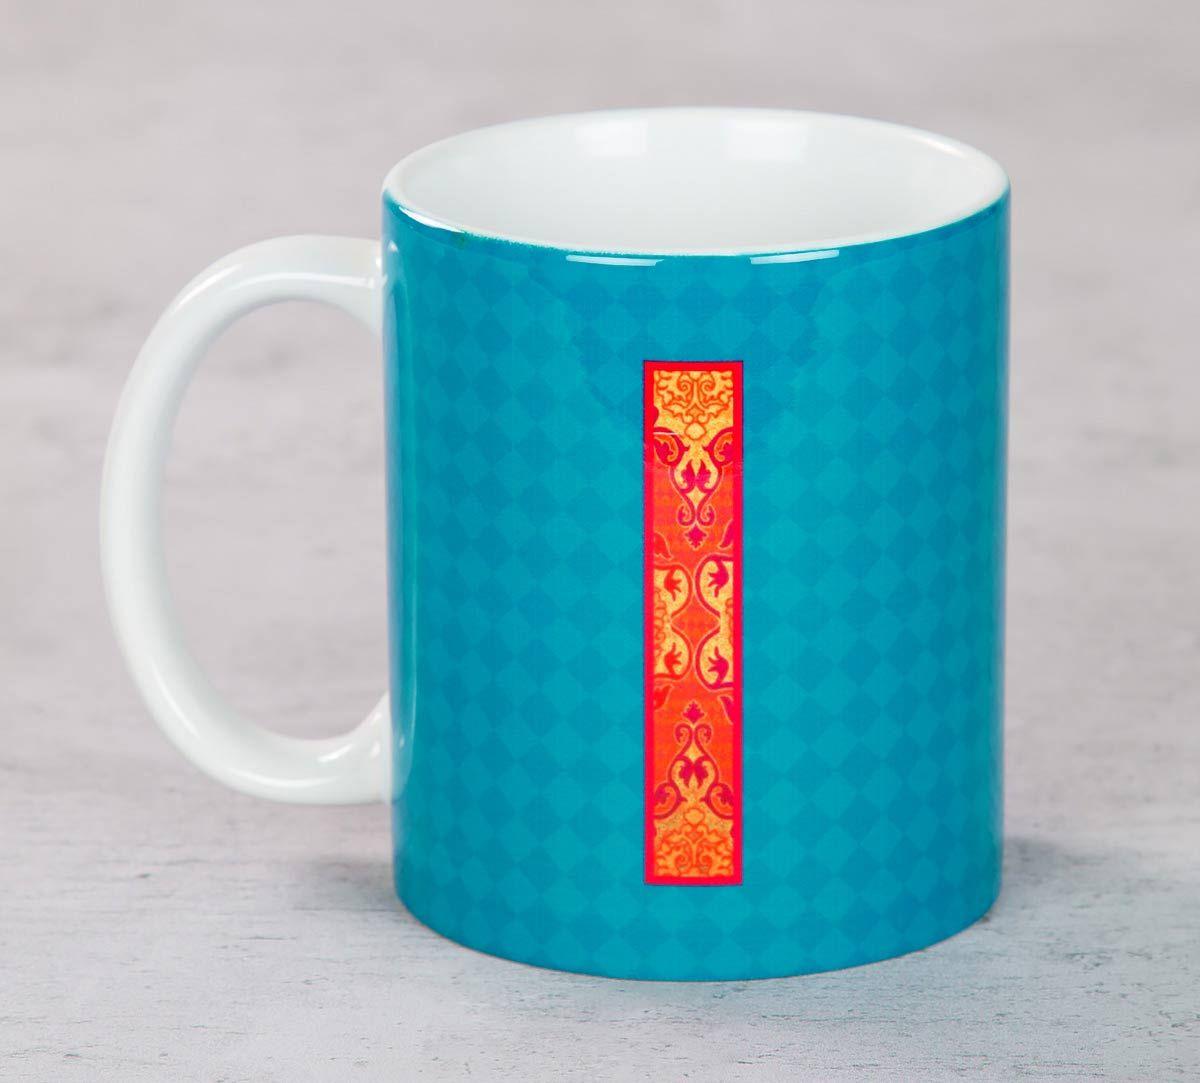 Latticed Iconic Coffee Mug